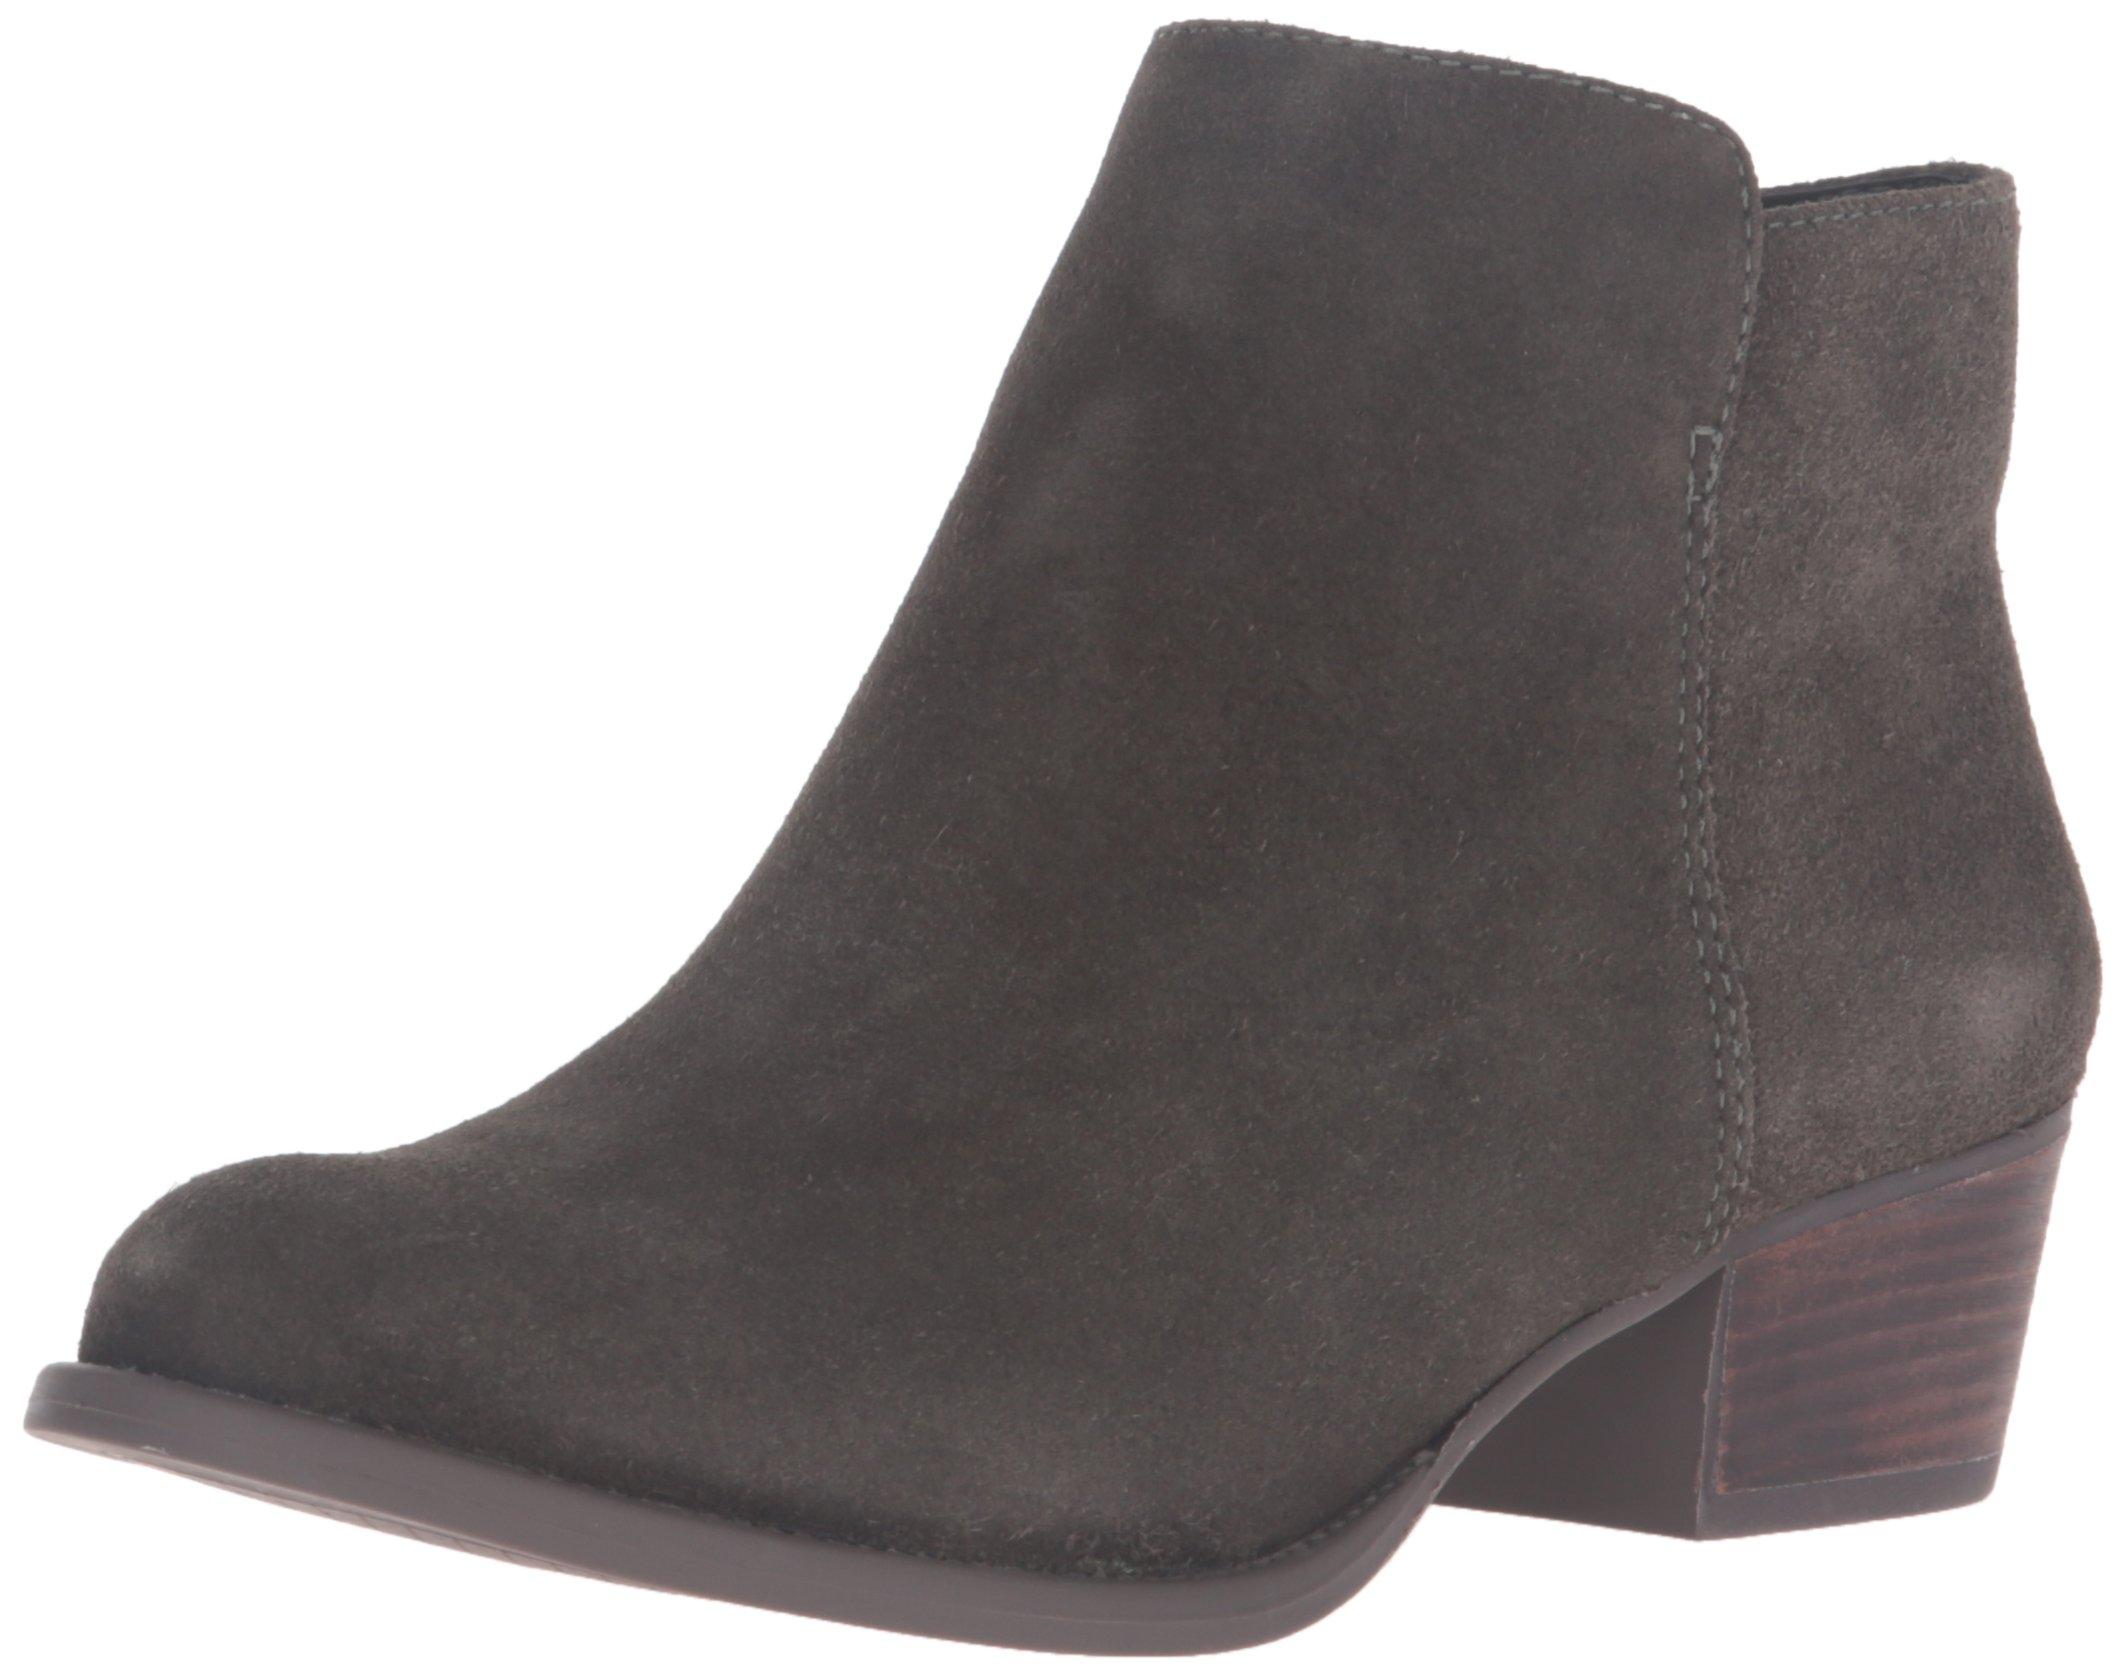 Jessica Simpson Women's Delaine Ankle Boot, Dark Moss, 8.5 Medium US